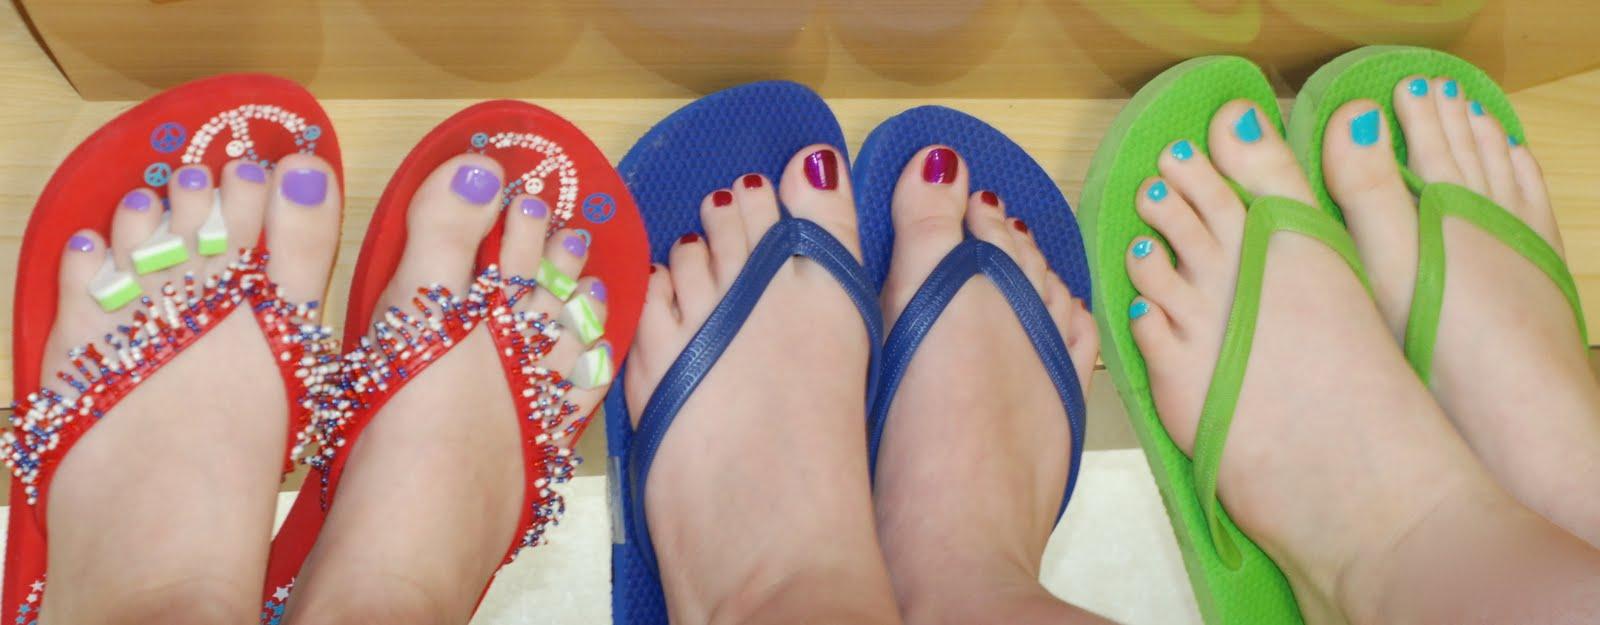 Get Those Toes Ready for Spring Break   Prairie Elementary PTA